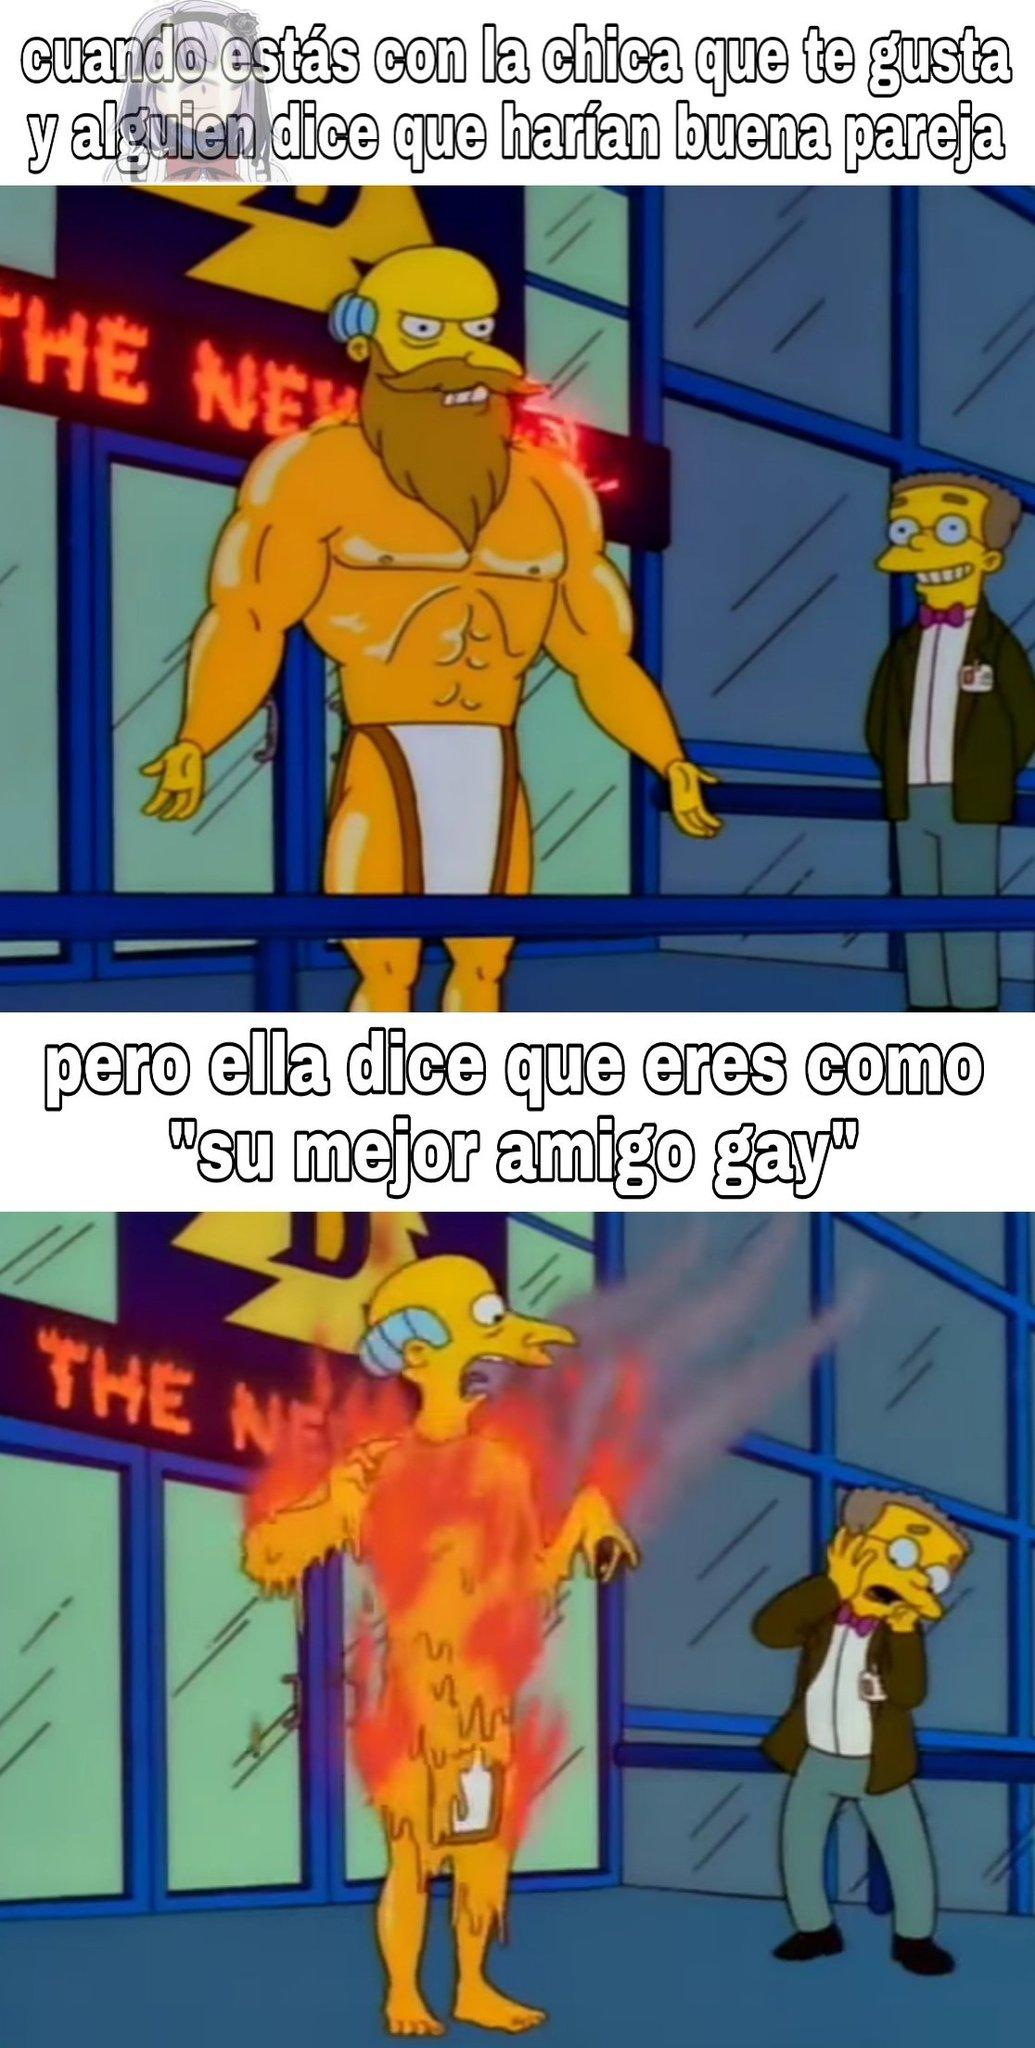 UvU - meme